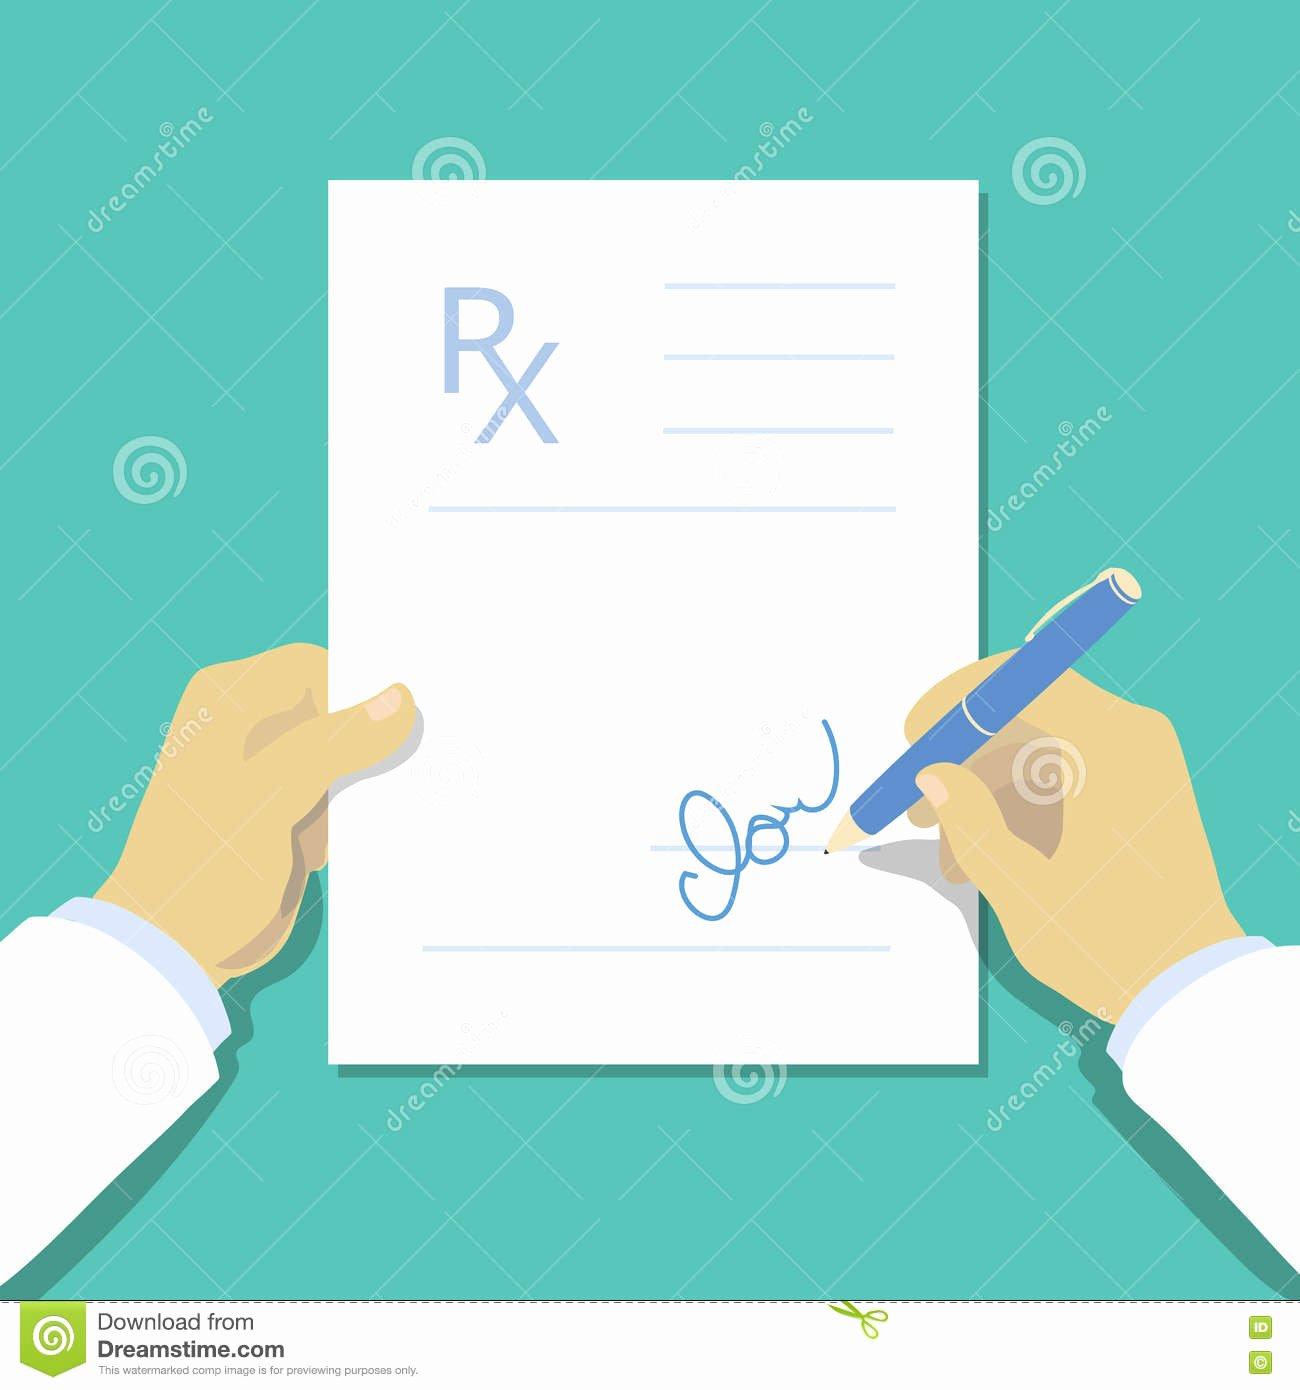 Doctor Prescription Pad Template Best Of Medical Prescription Pad Flat Design Style Rx form Stock